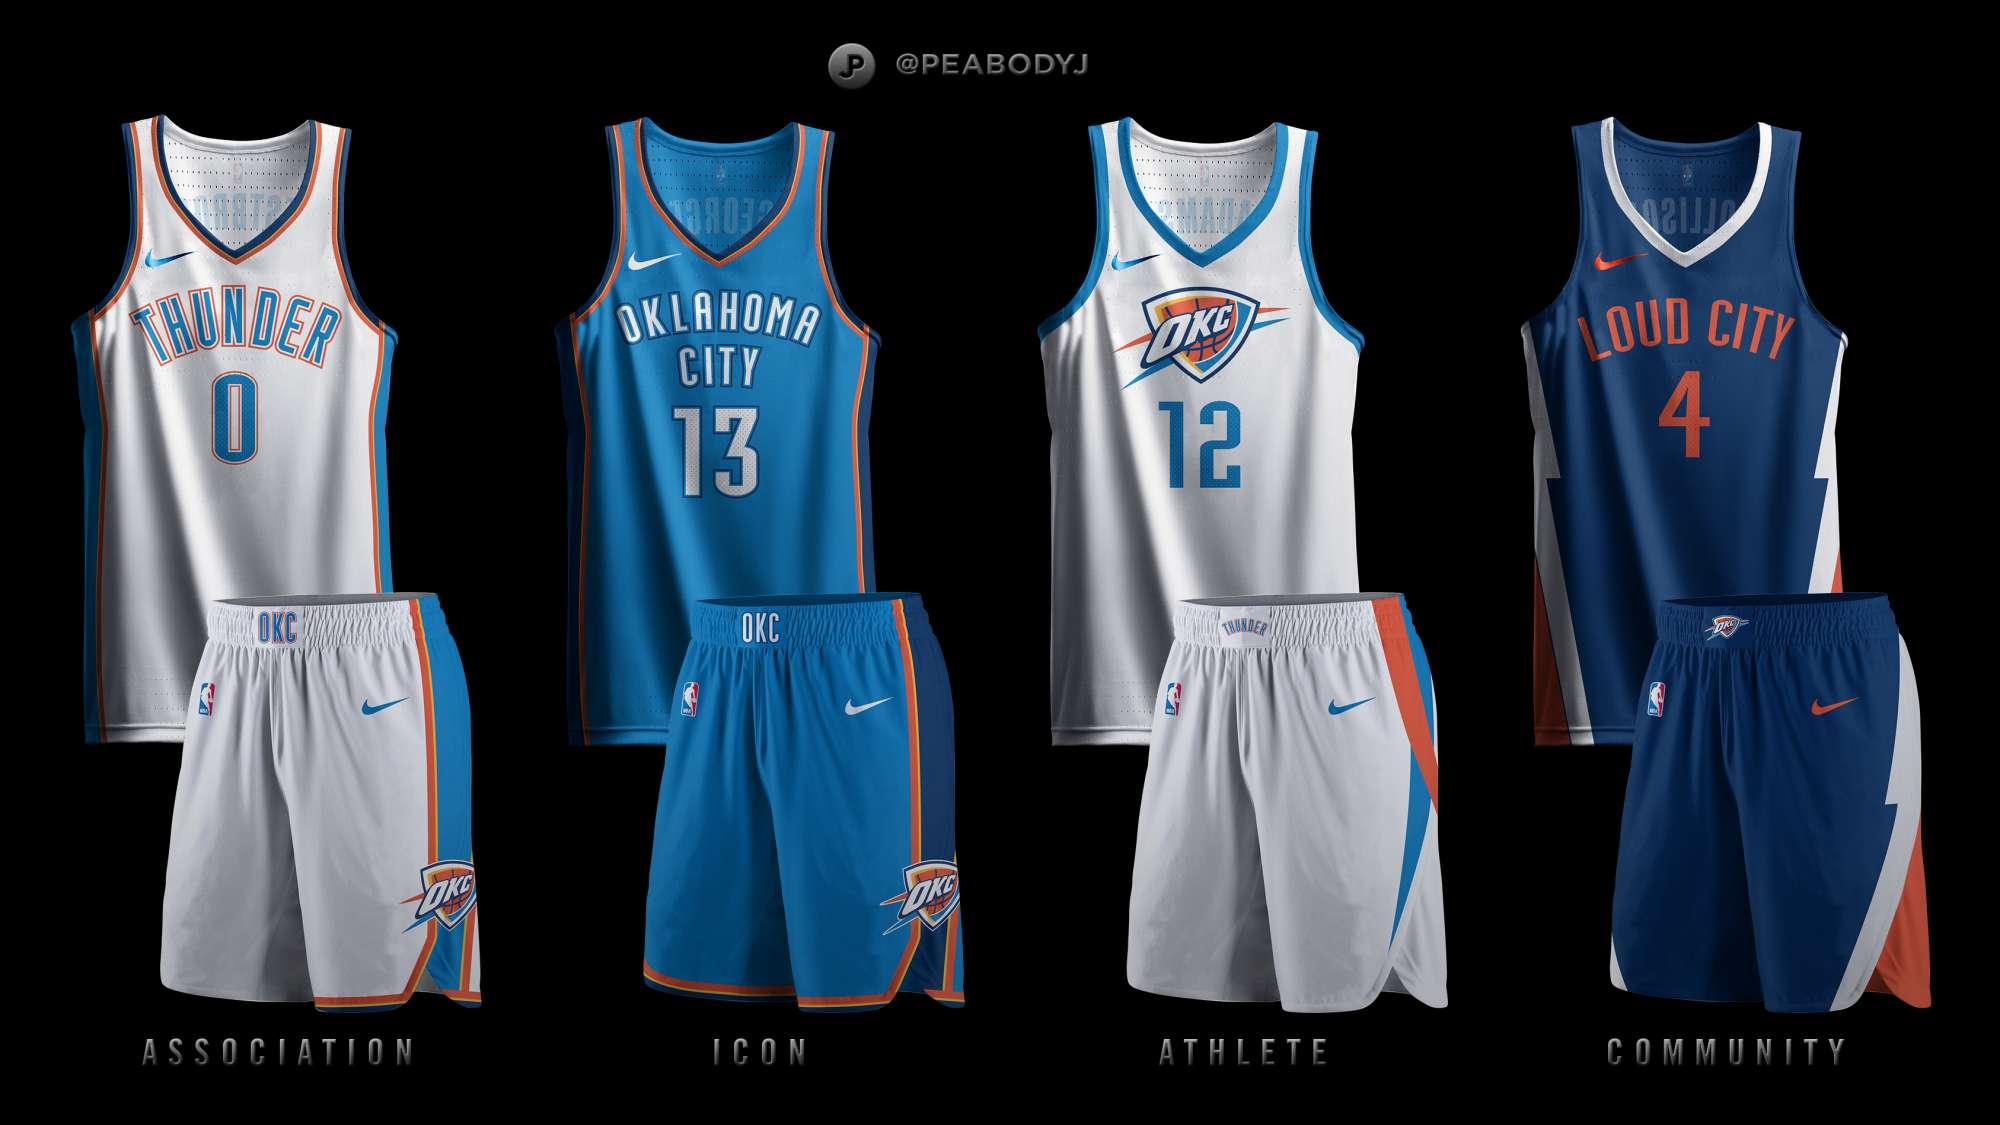 34d4a19db7c Oklahoma City Thunder x Nike Concepts - Concepts - Chris Creamer s ...